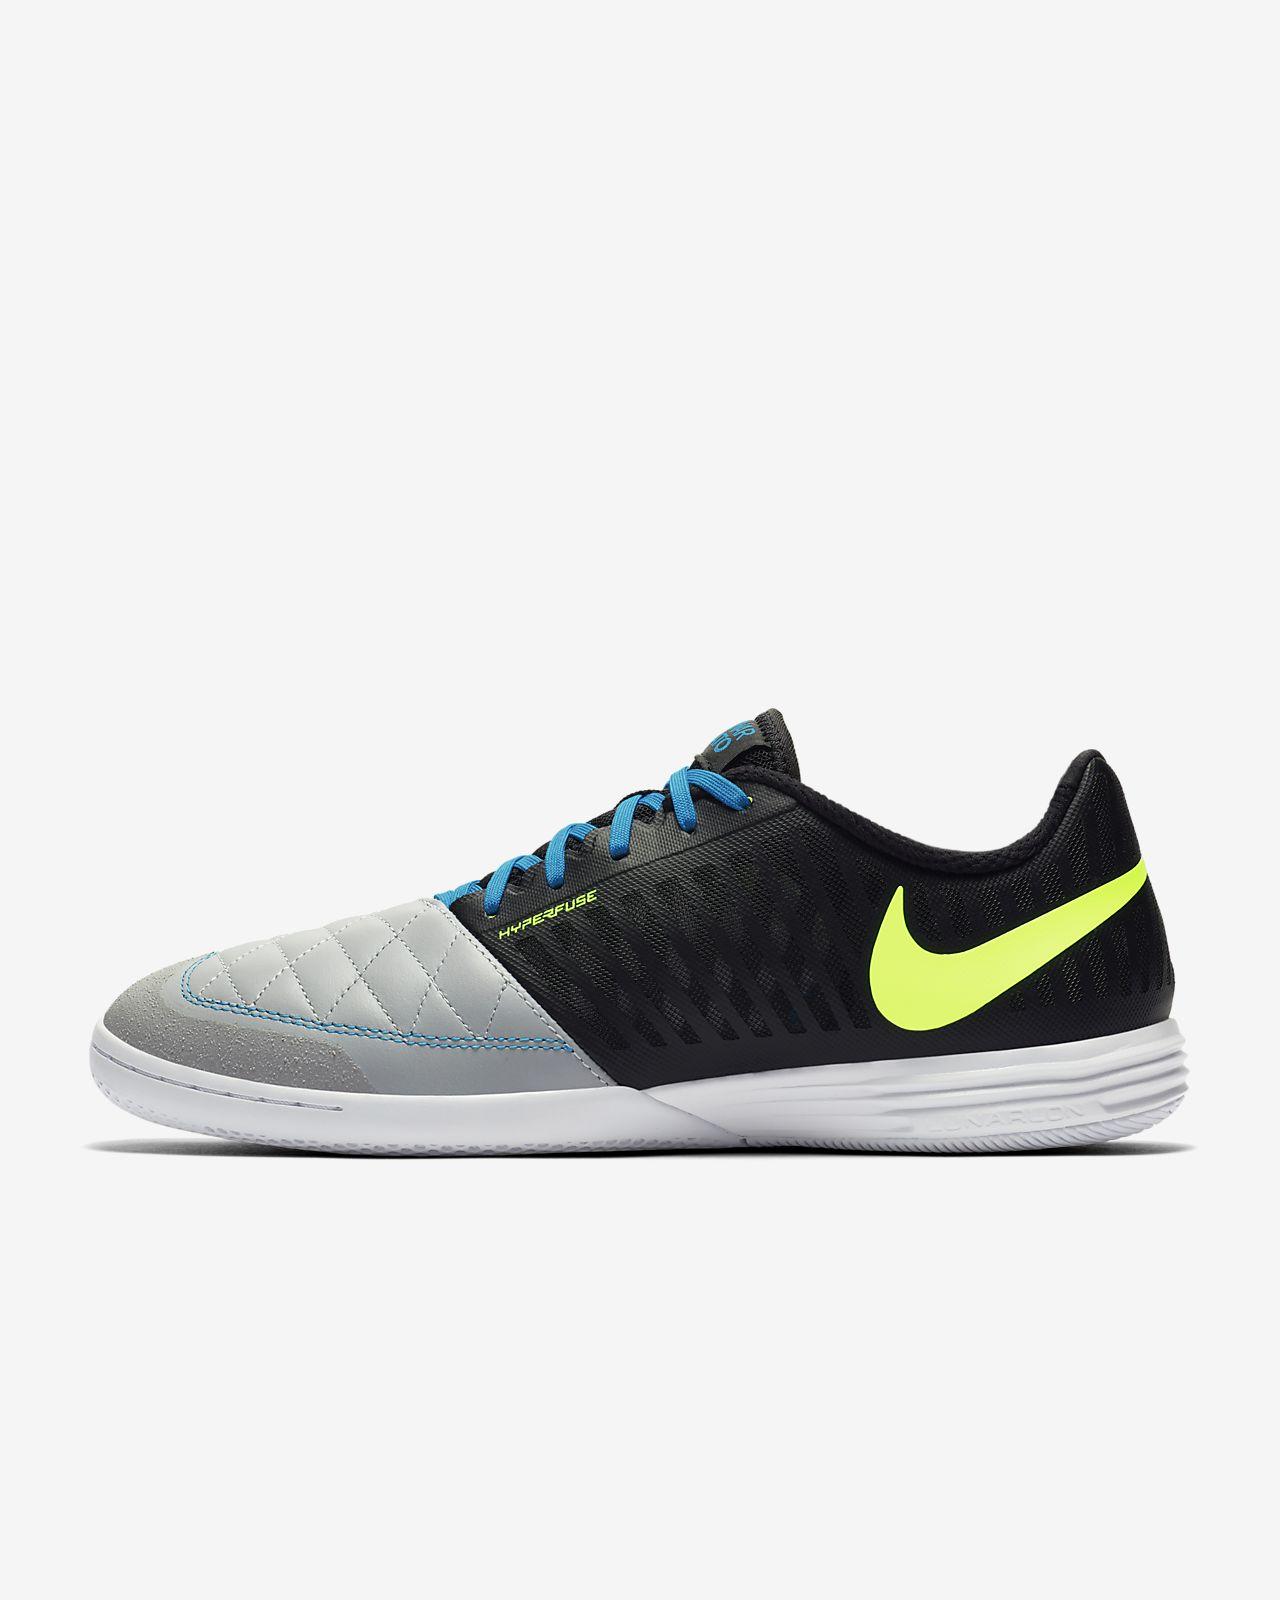 Chaussure de football en salle Nike Lunar Gato II IC